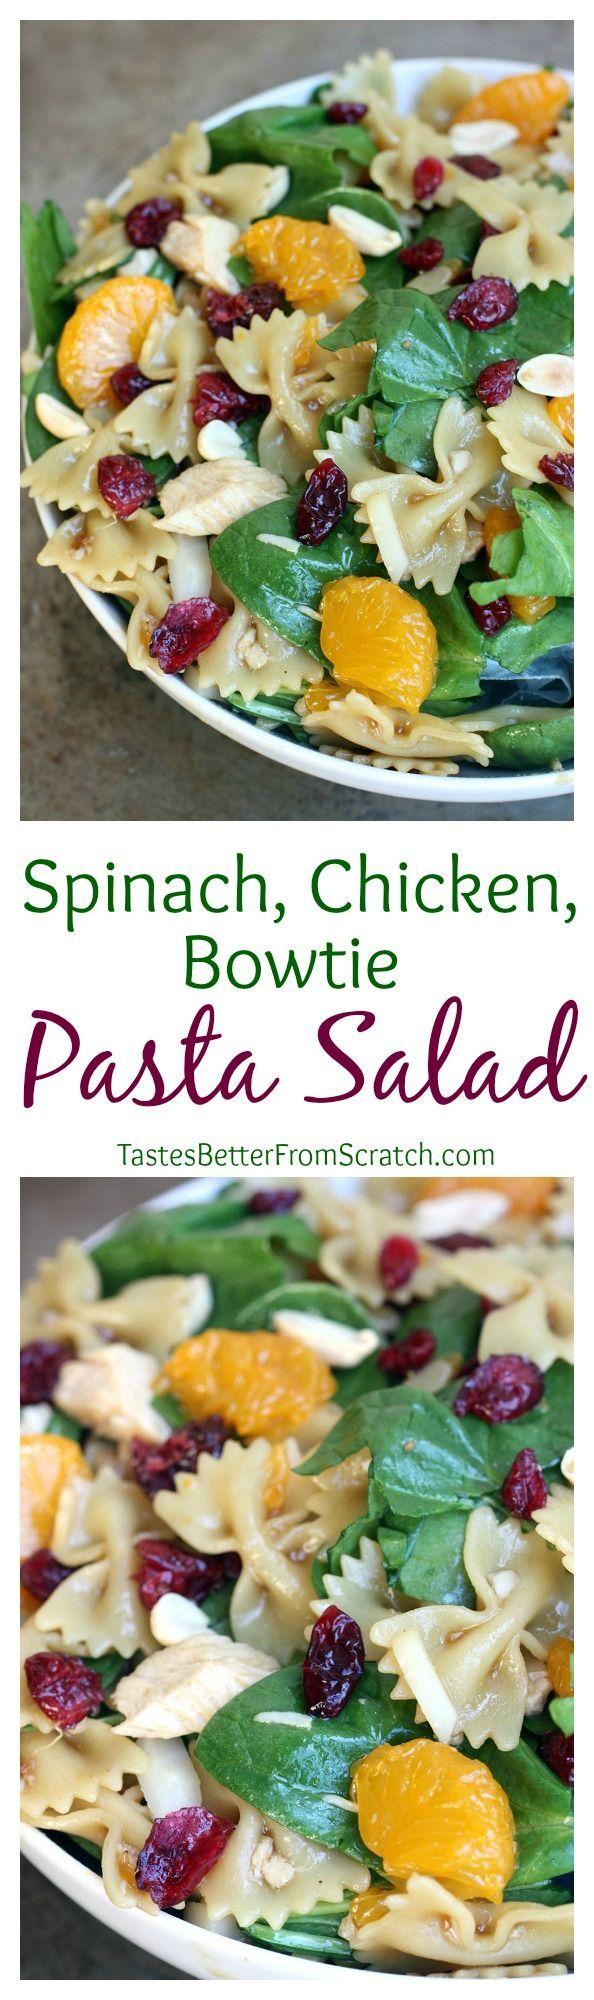 Spinach, Chicken, Bowtie noodle Pasta Salad with a Teriyaki Vinaigrette--my FAVORITE pasta salad!